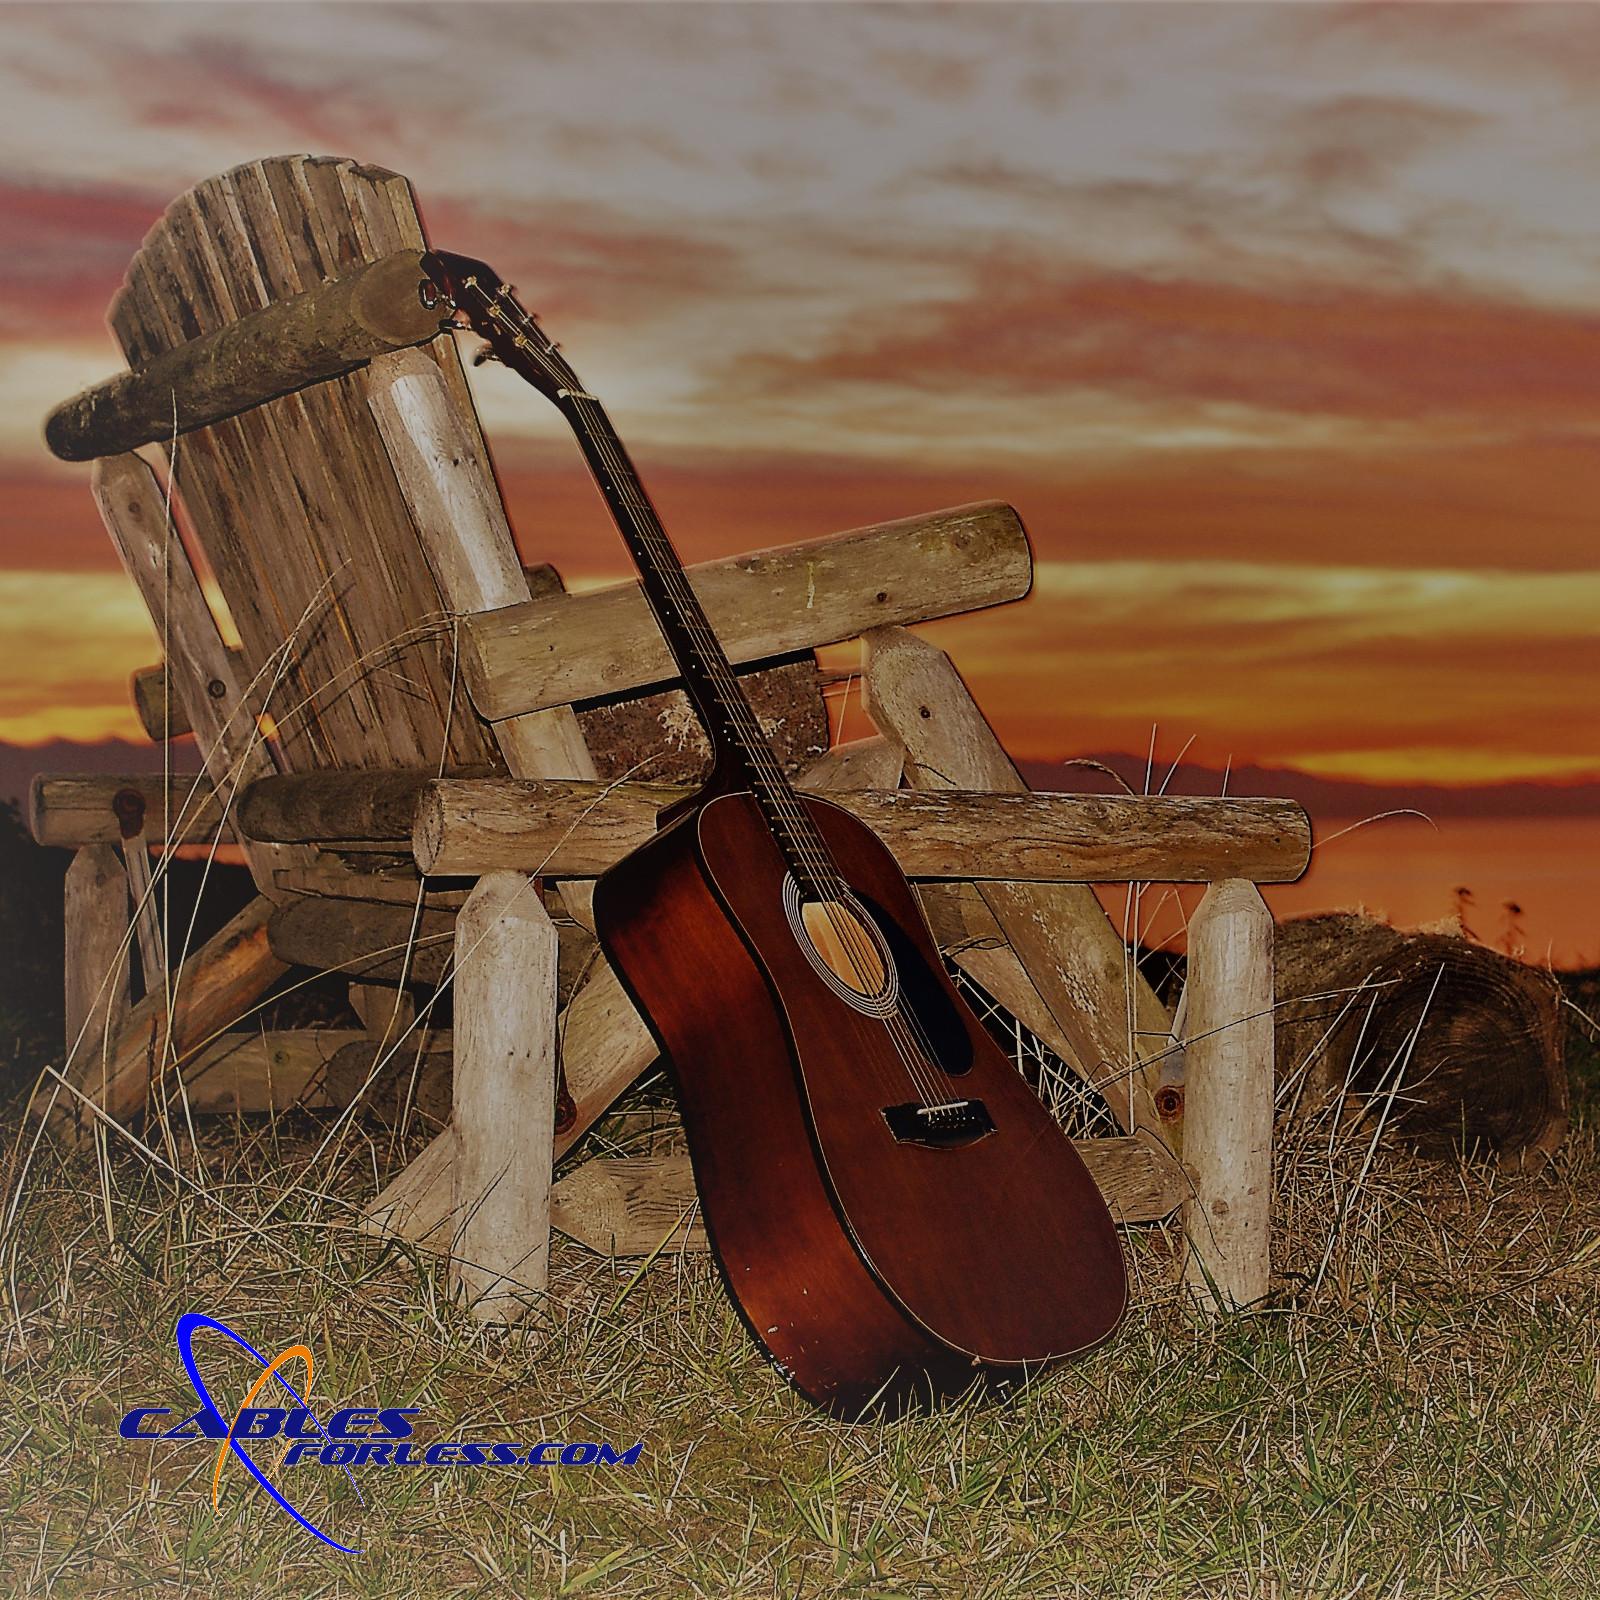 sunset-guitar-with-logo.jpg